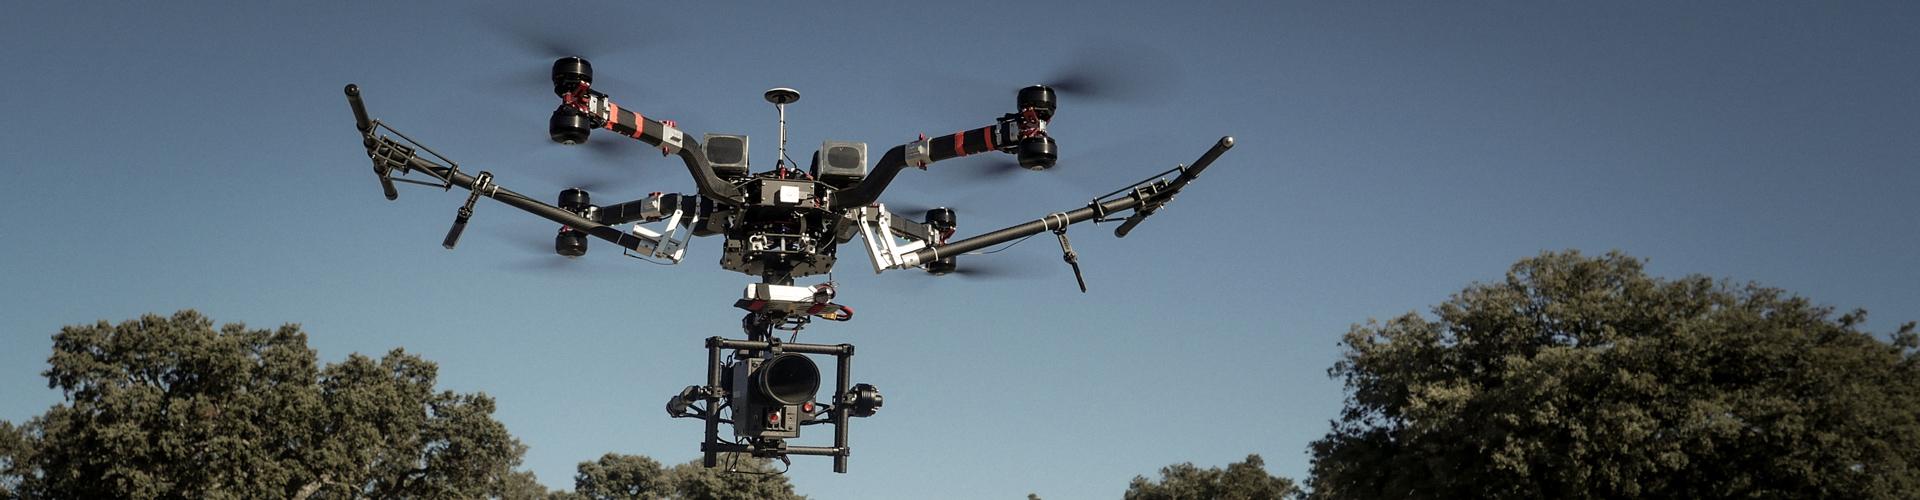 Prime Elements Heavy Lift Drohne mit Red Kamera Anvifilms